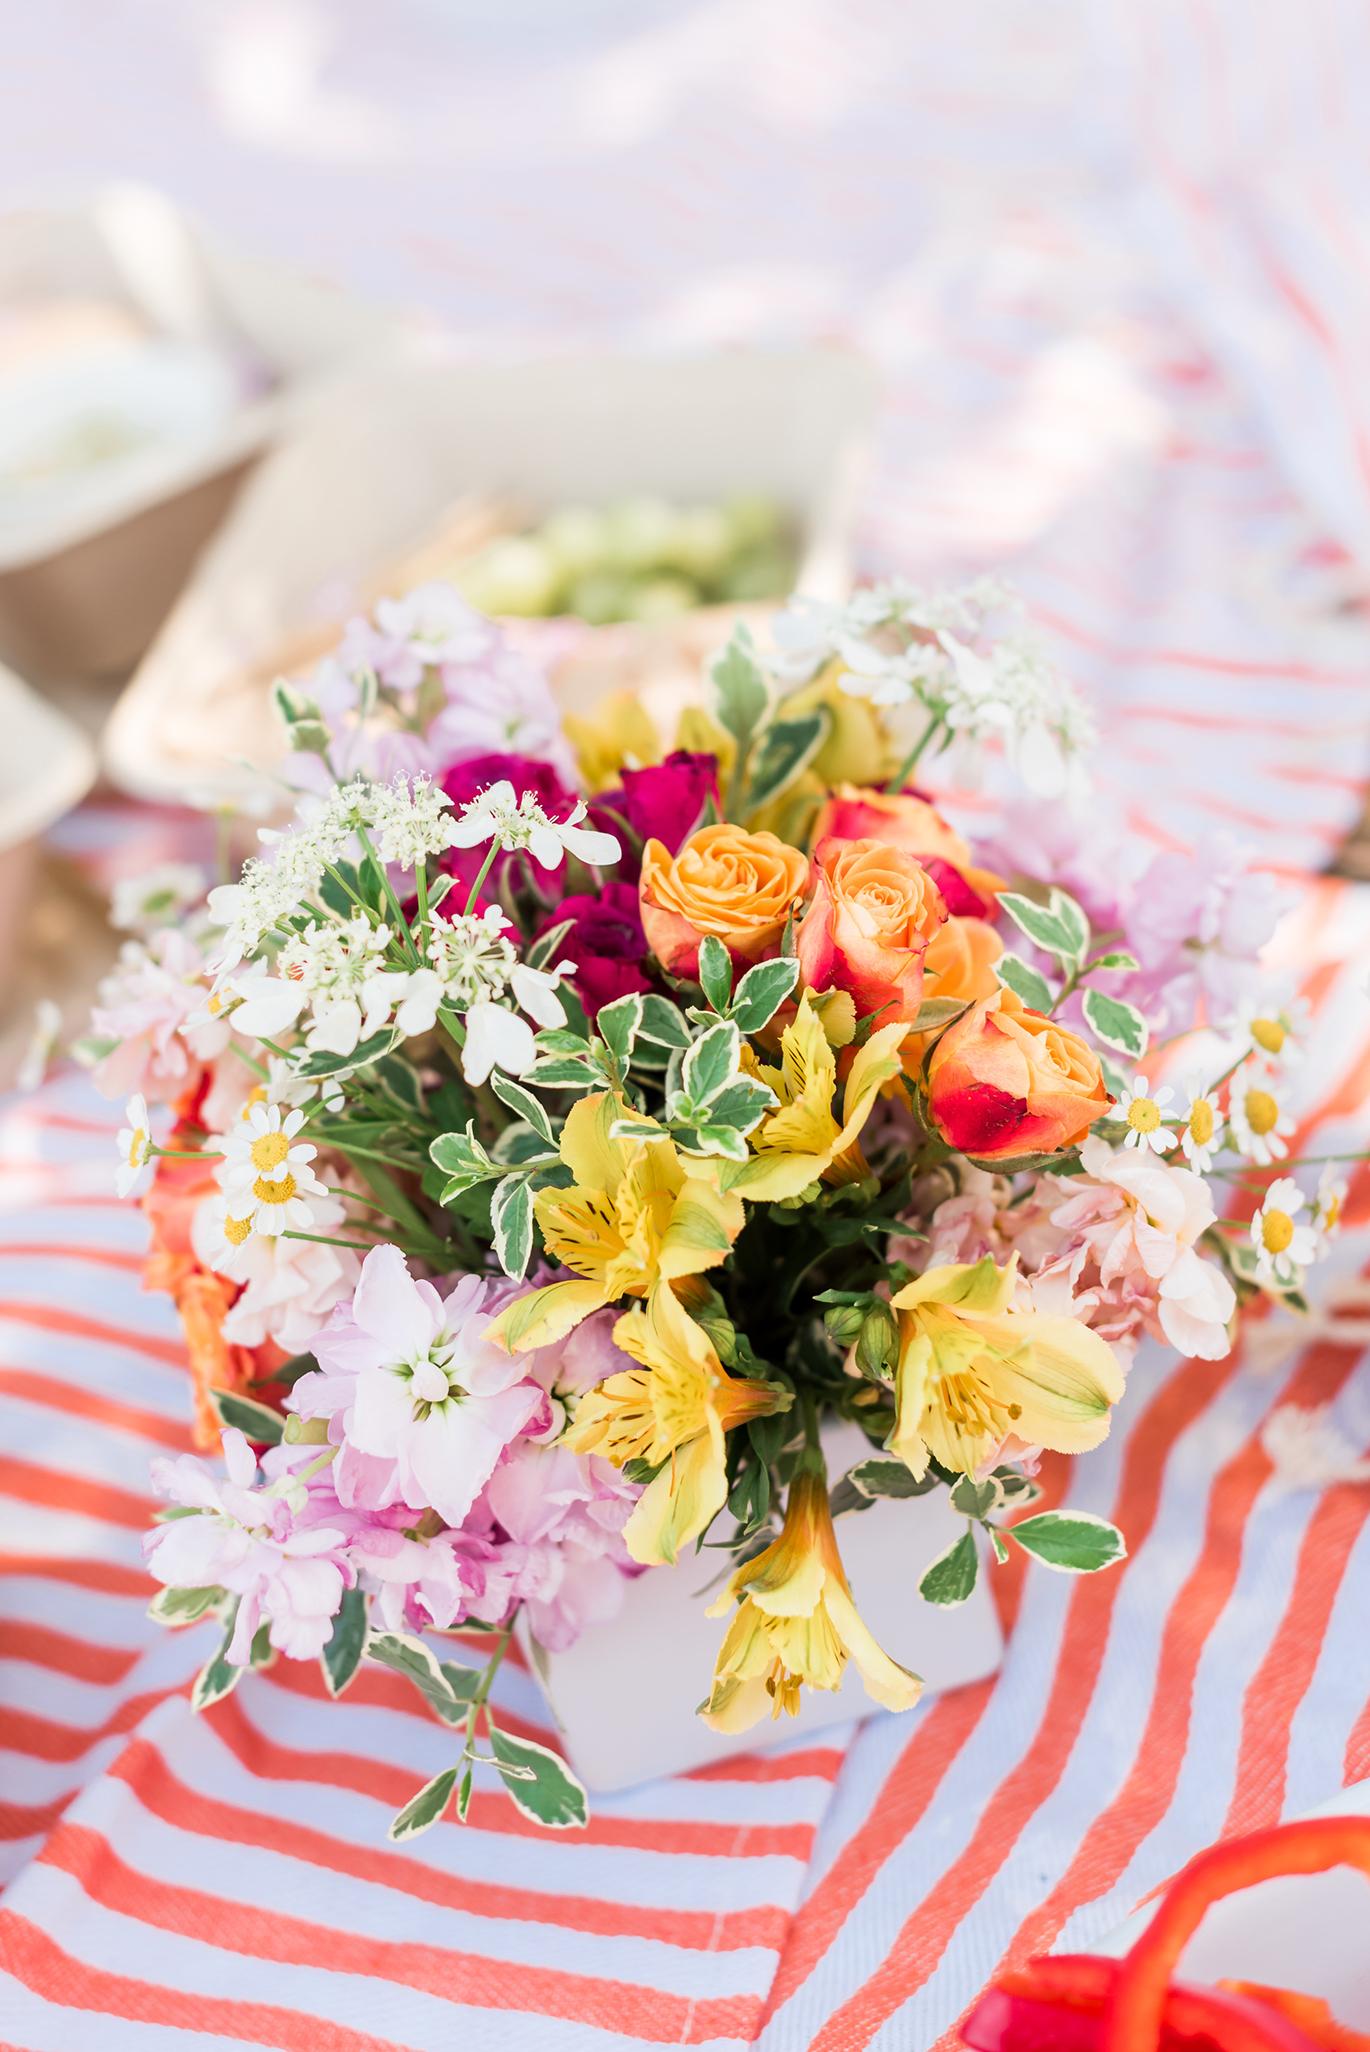 Summer floral arrangement